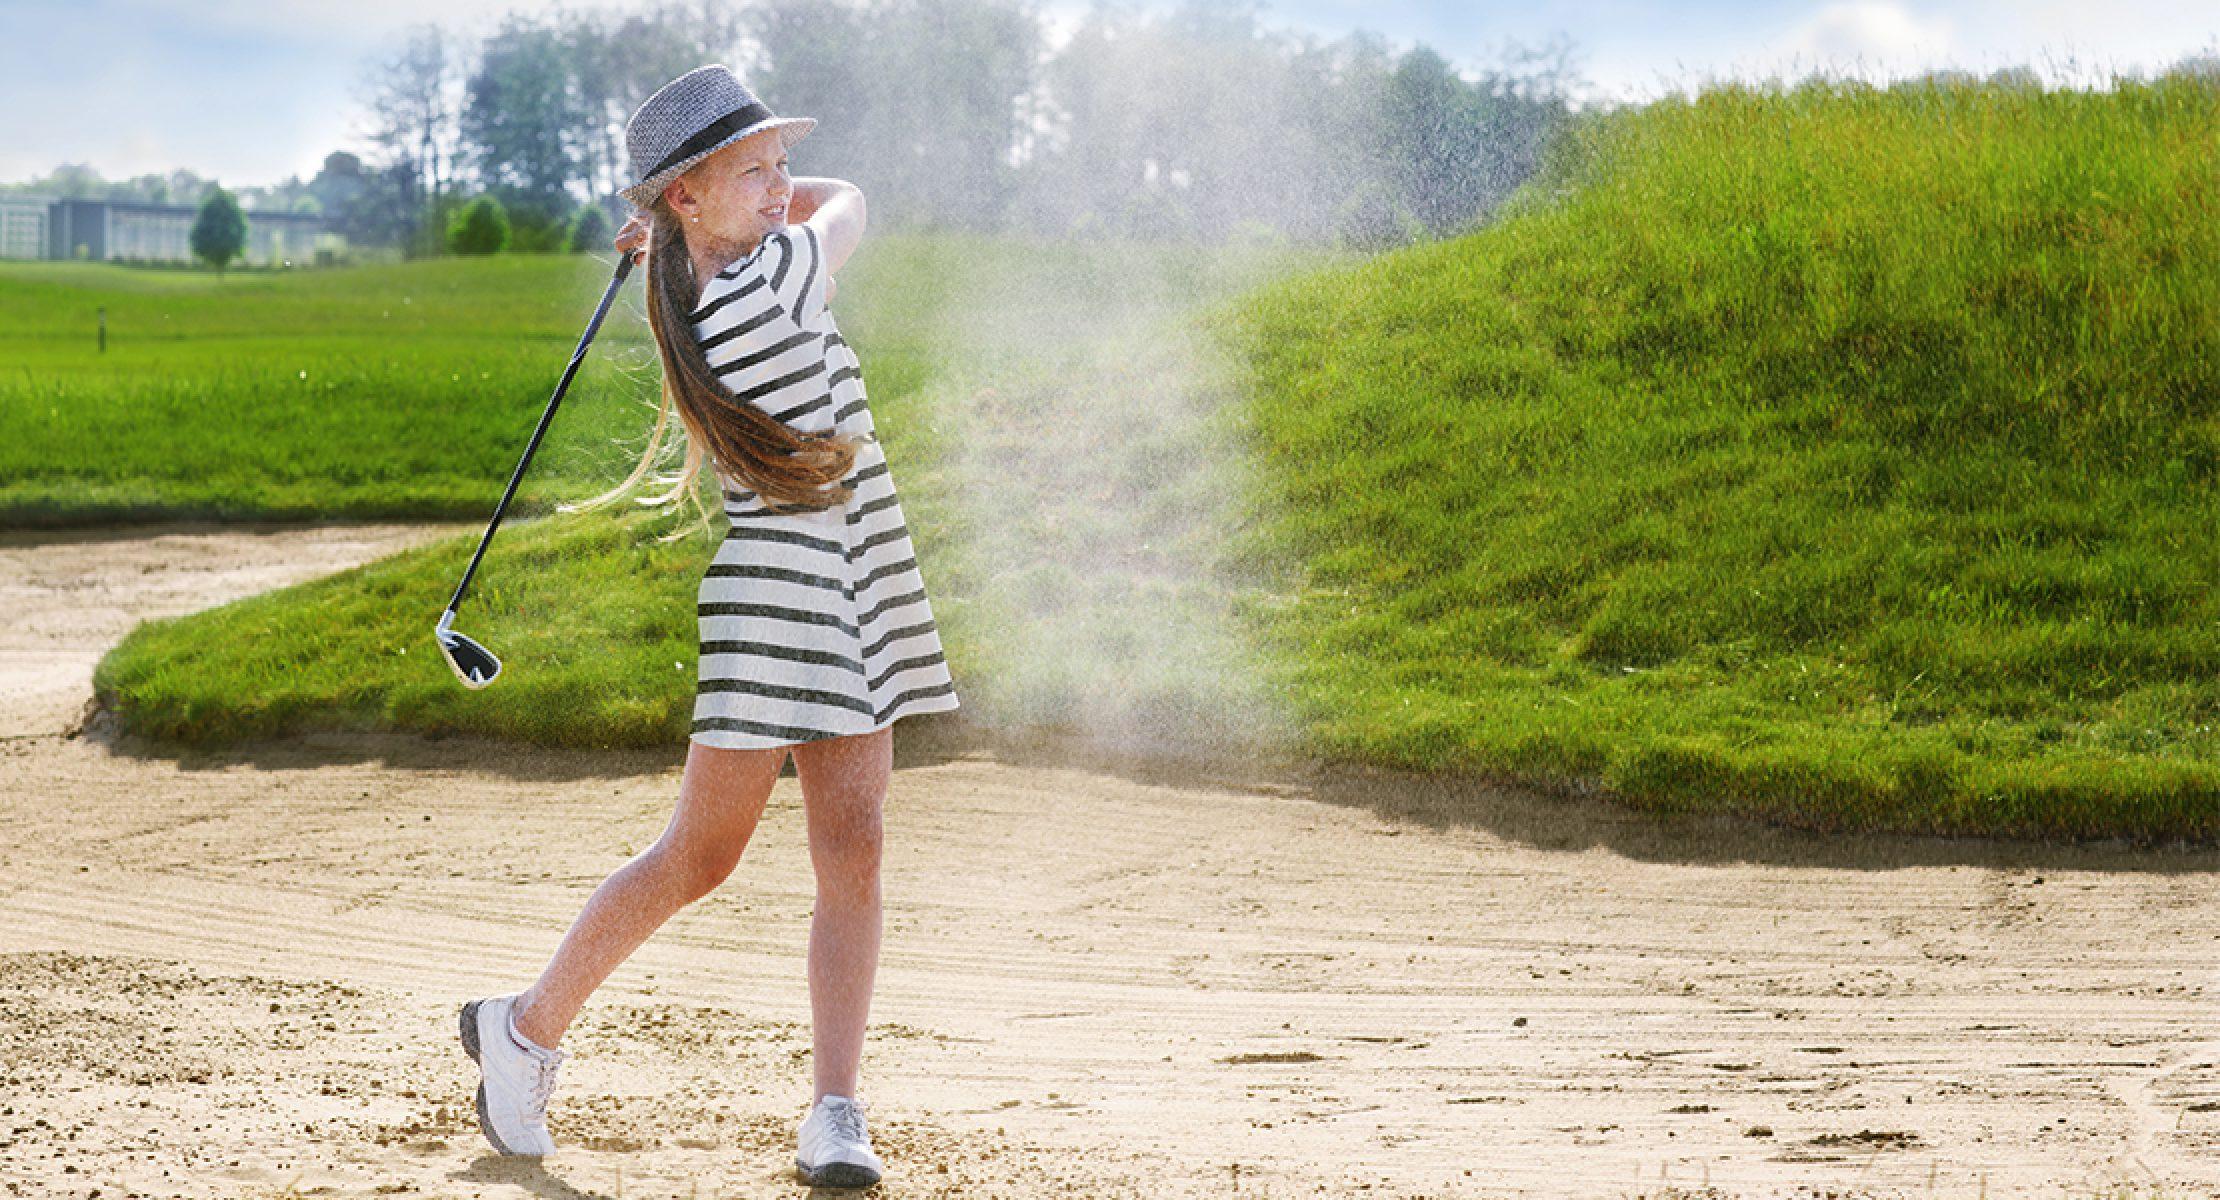 Teaching Young Kids Golf Lehigh Valley Marketplacelehigh Valley Marketplace